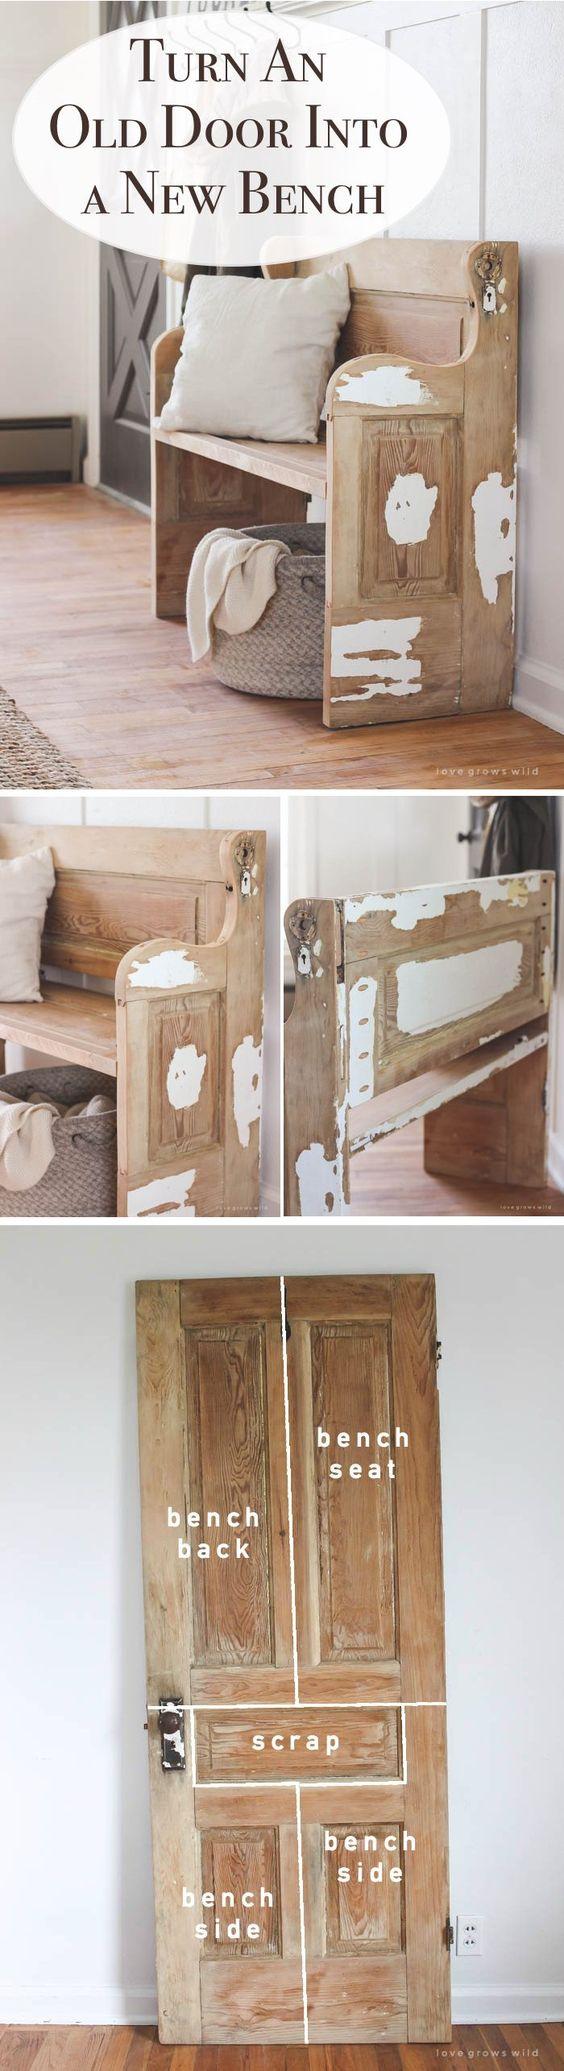 5 A Door Bench Simphome com